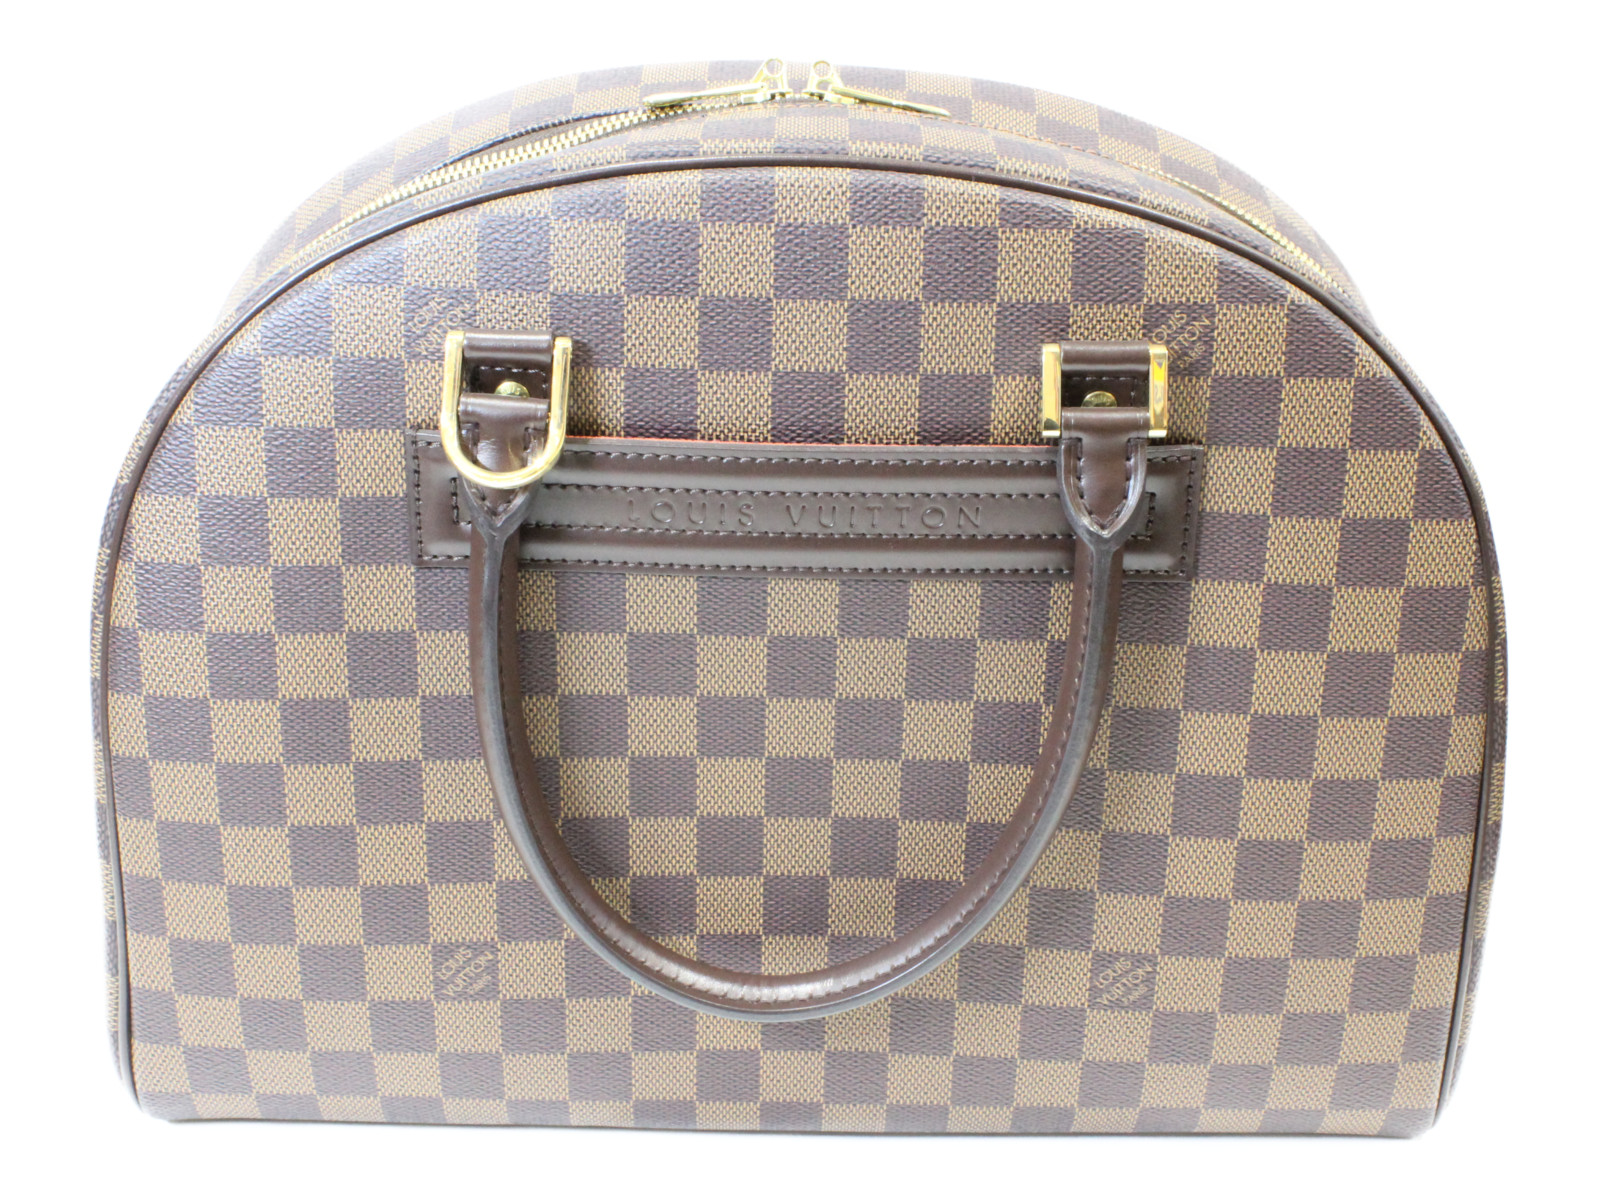 LOUIS VUITTON ルイ ヴィトンノリータ N41455ハンドバッグ ダミエ・エベヌプレゼント包装可 【中古】